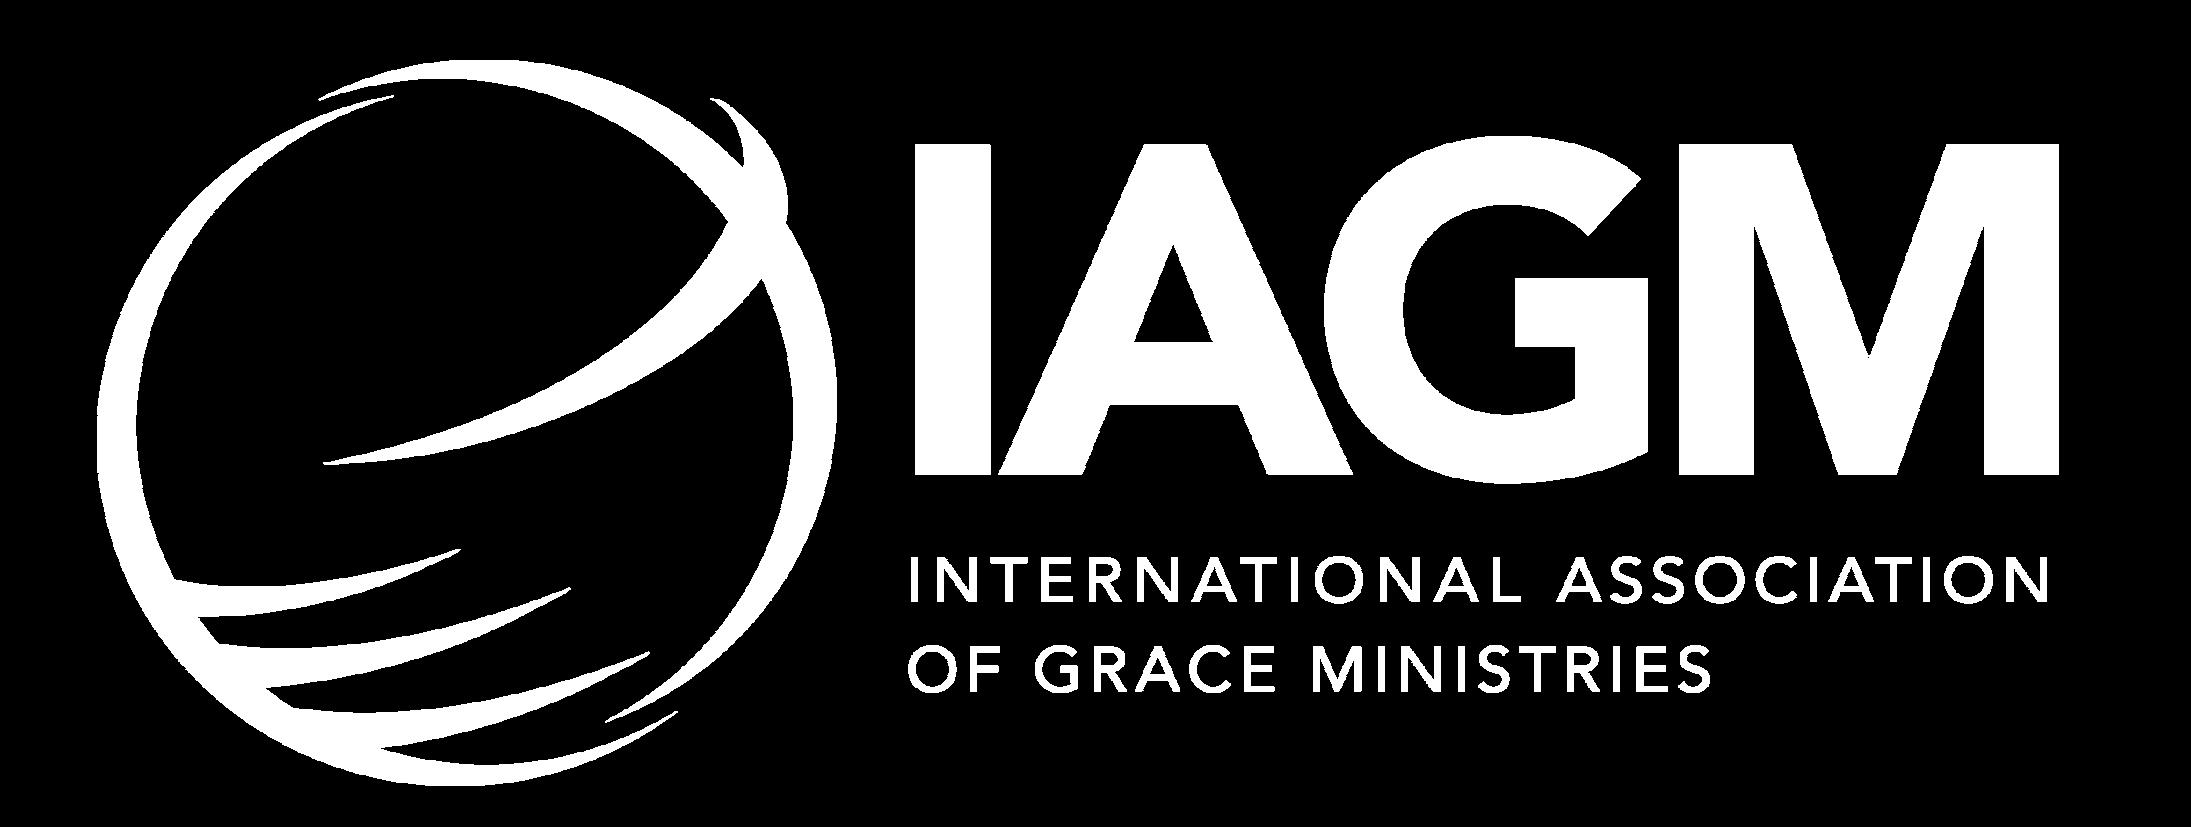 International Association of Grace Ministries